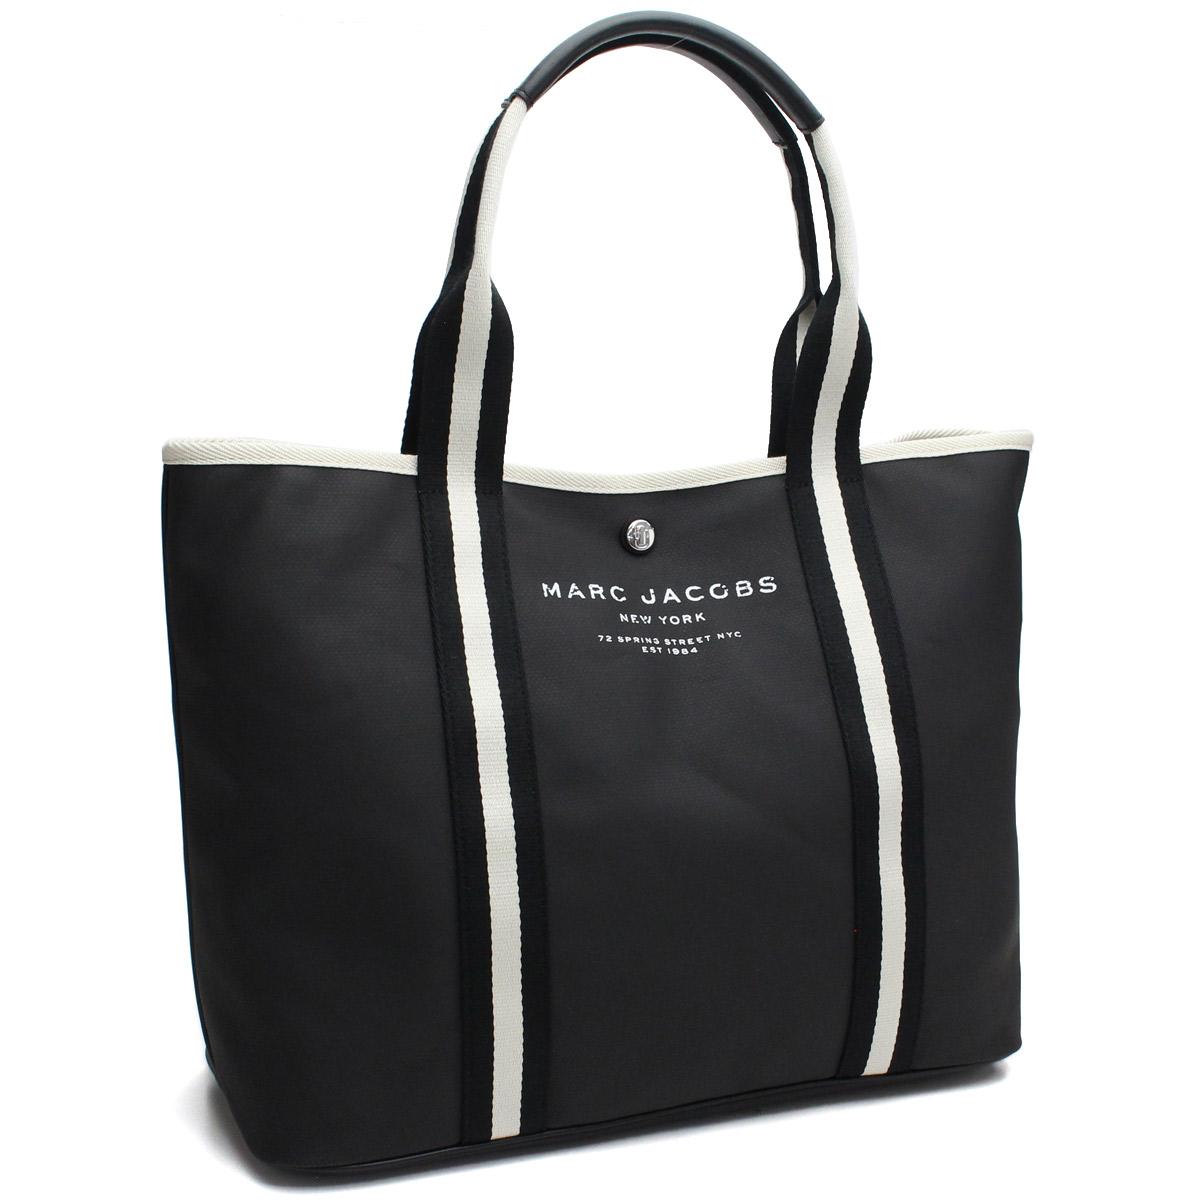 fa8911fb5442 Bighit The total brand wholesale  Mark Jacobs (MARC JACOBS) coating canvas  tote bag M0012008 001 BLACK black